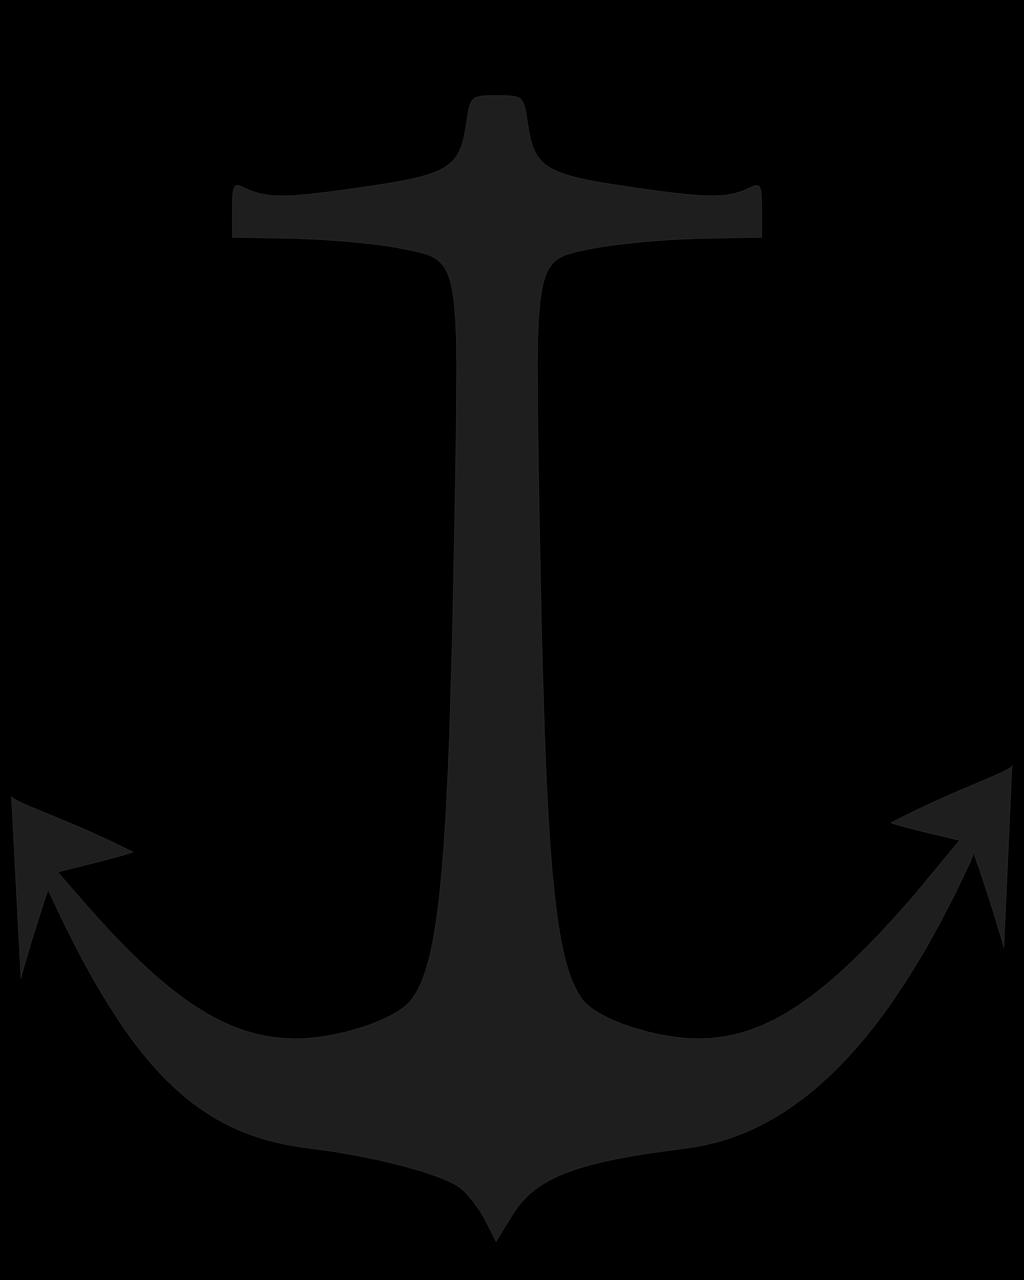 Boat anchor ship navy.